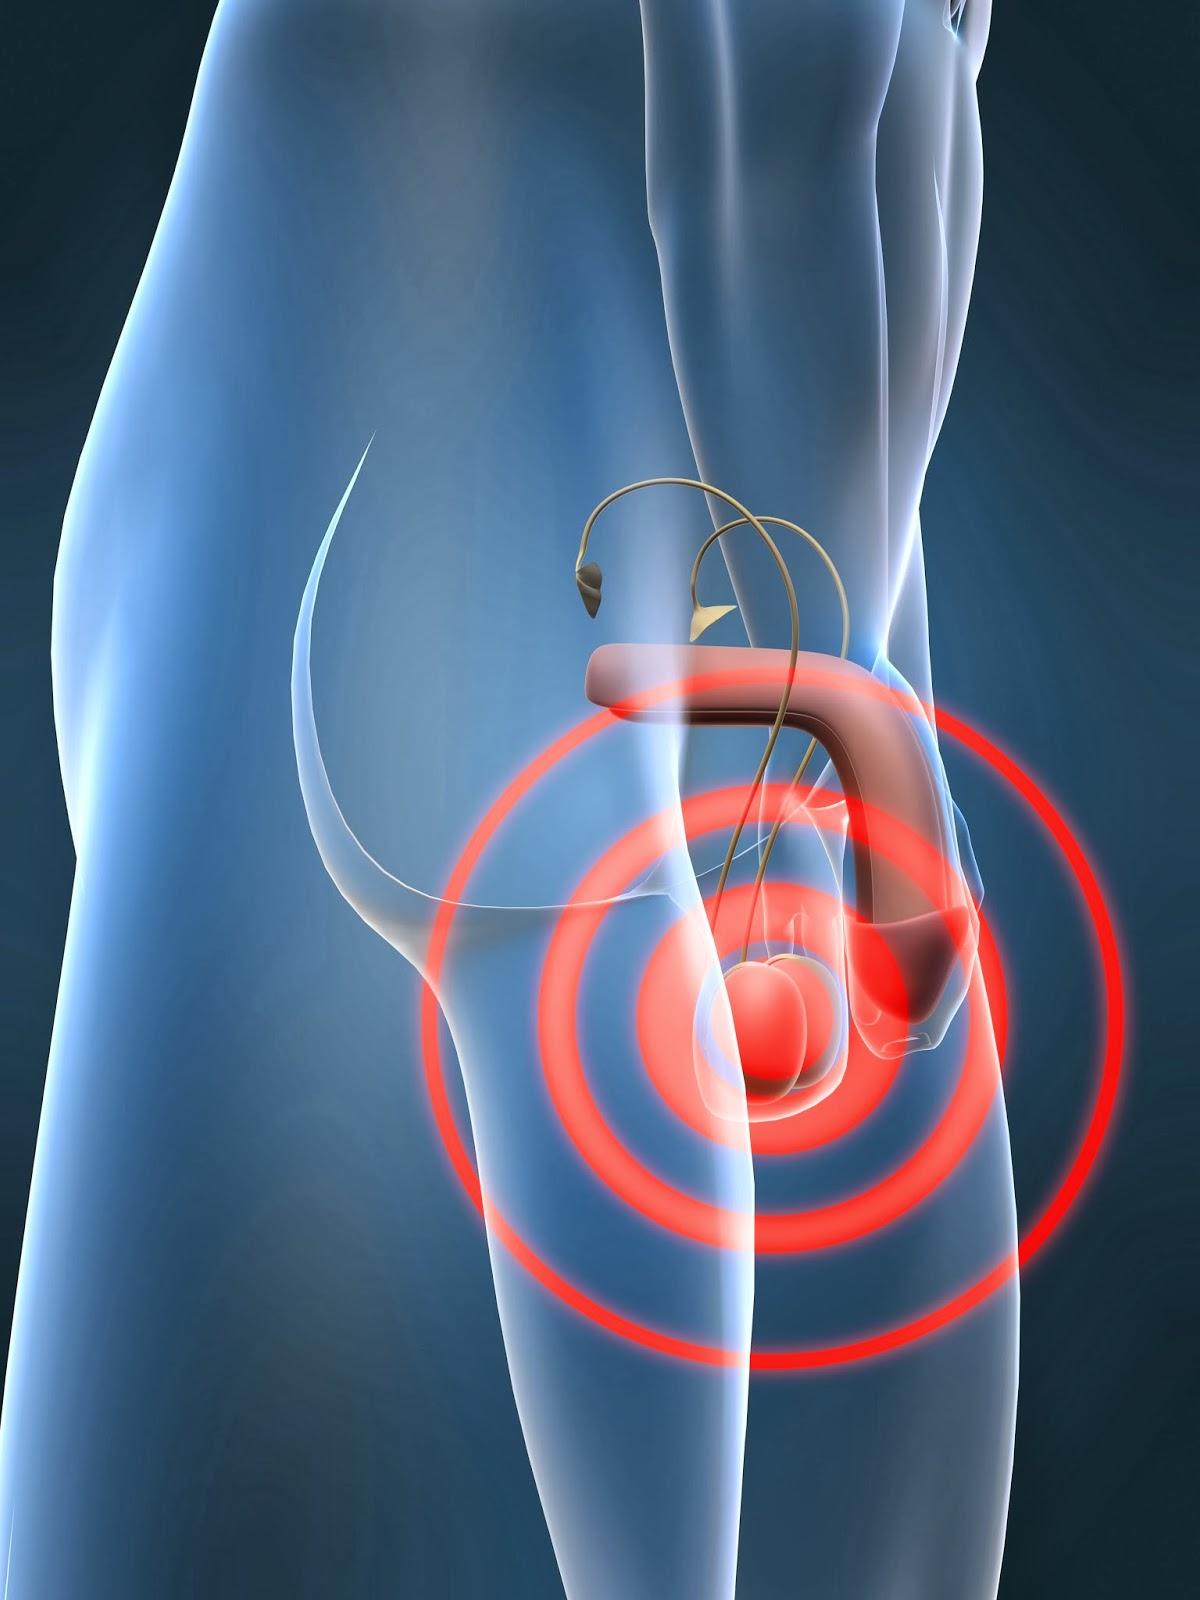 testicular torsion. testicular torsion: what every parent should know torsion